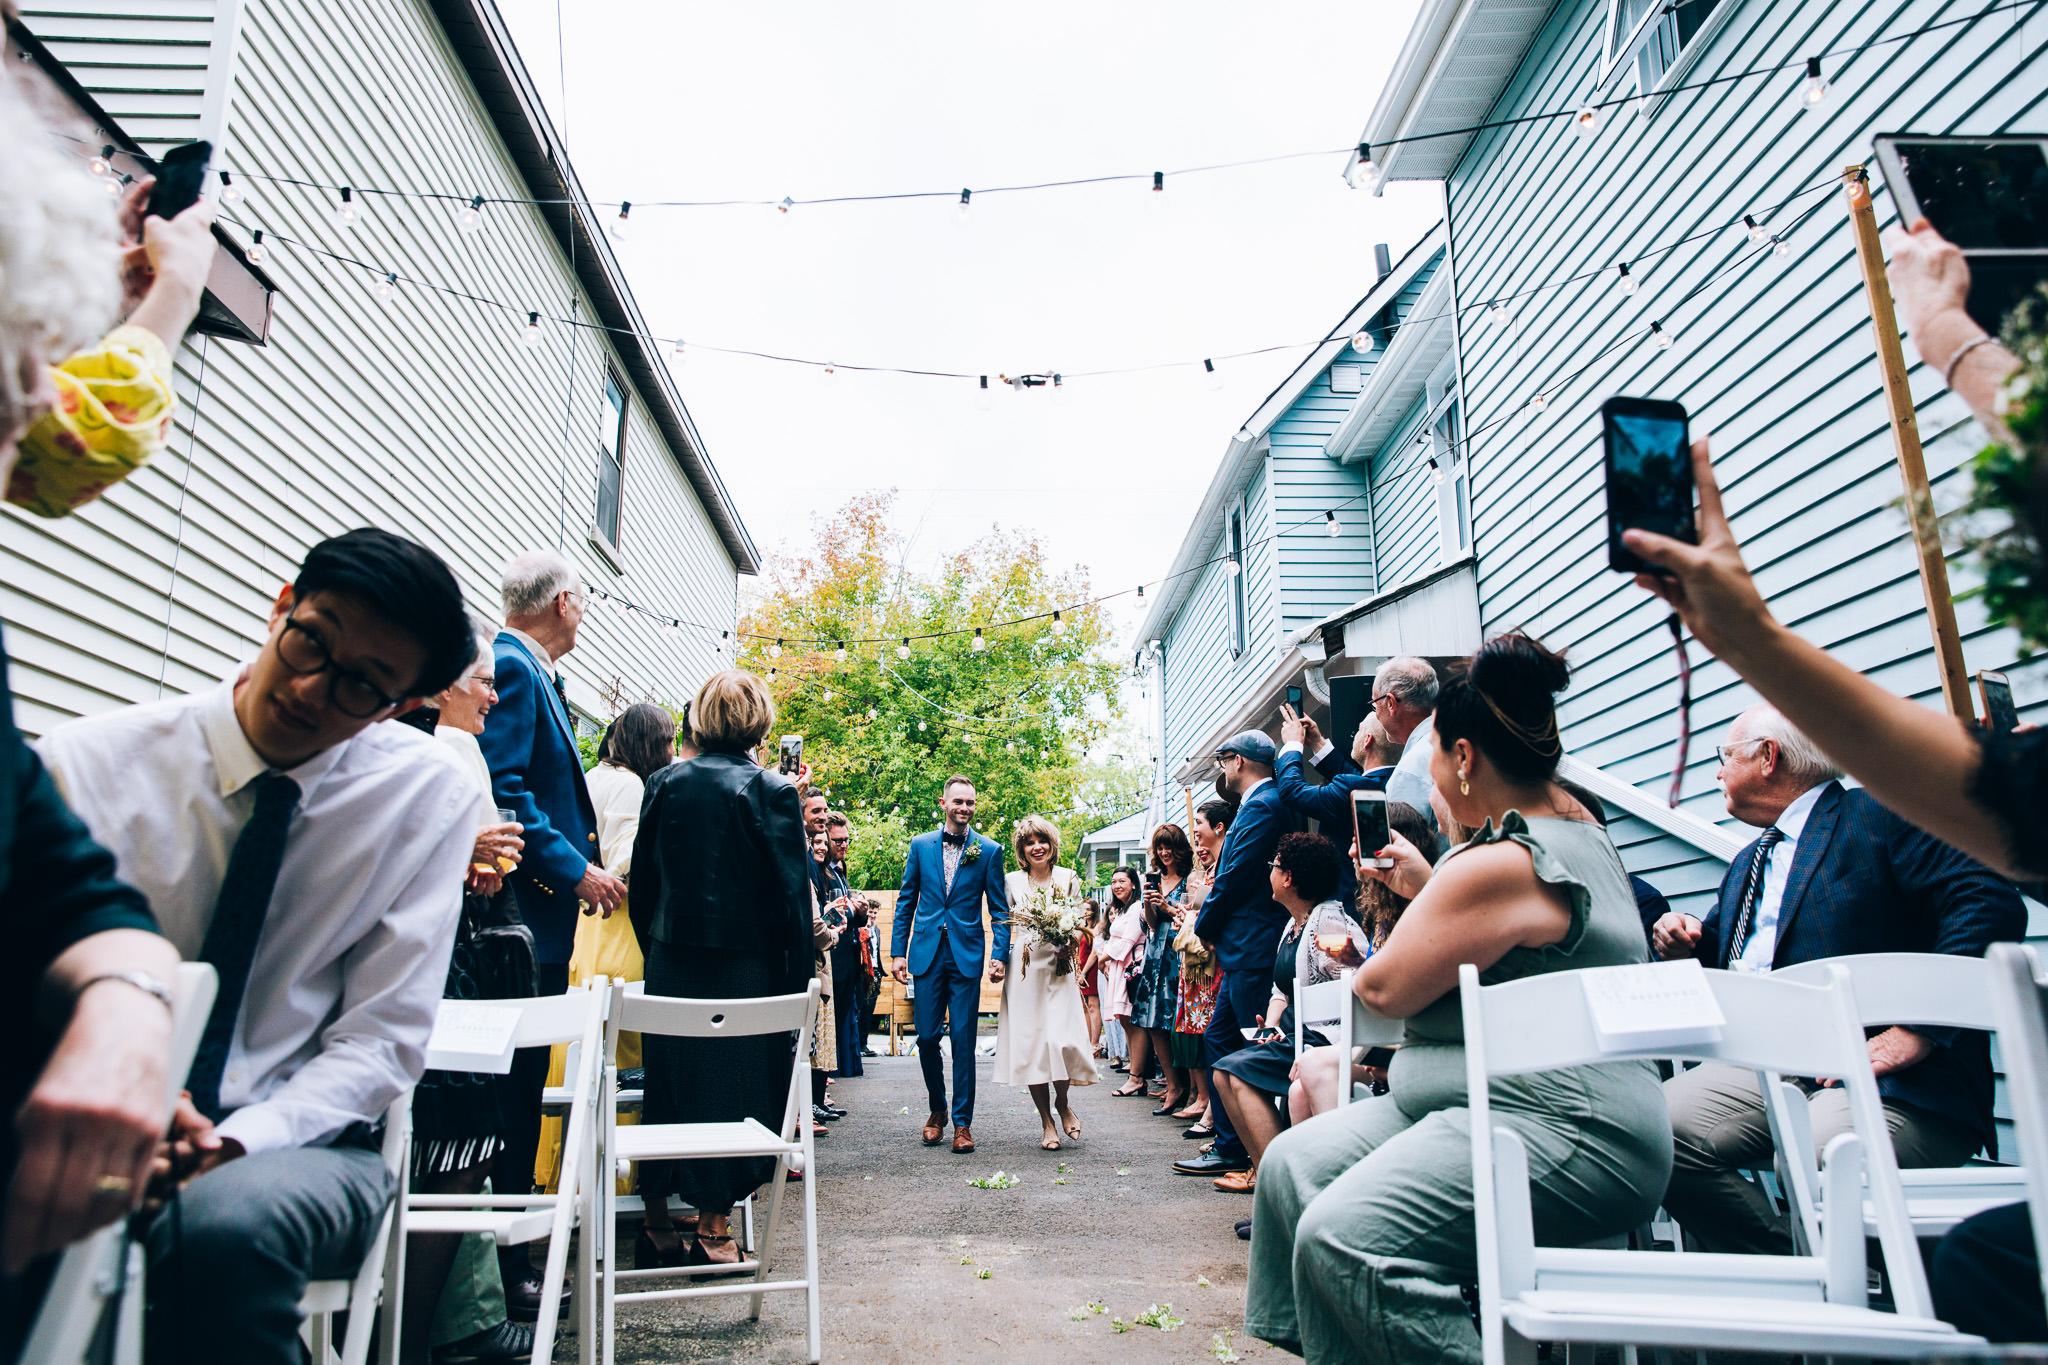 041_Canada-documentary-wedding-photograp